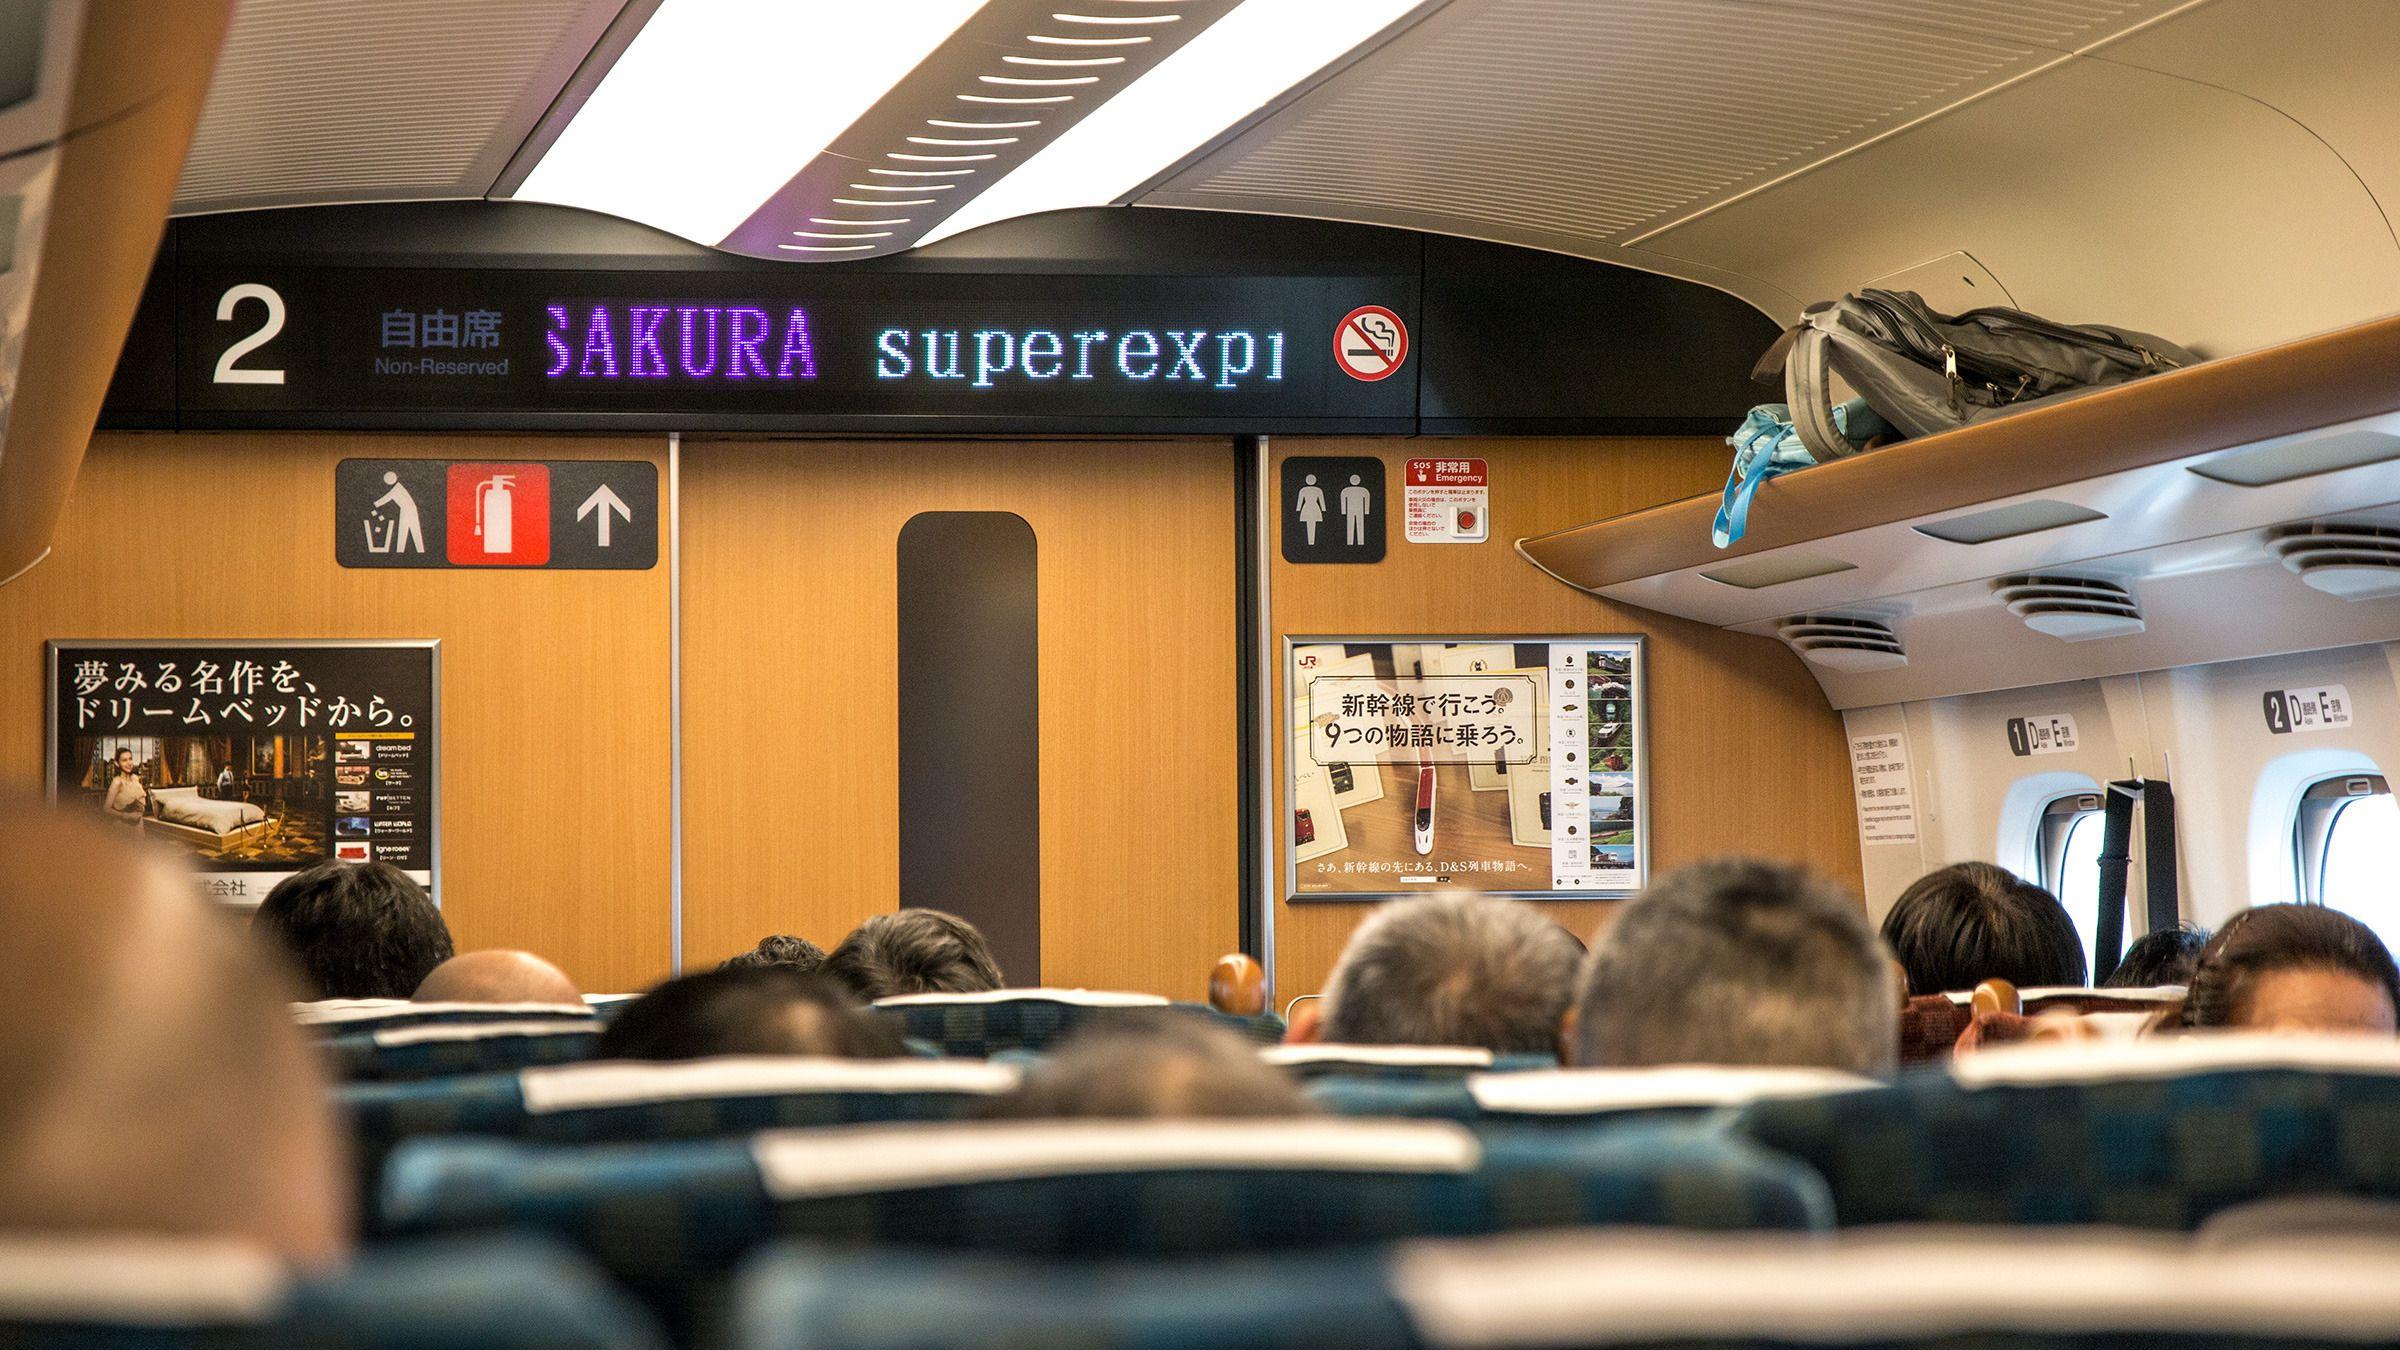 Interiøret i de nyere togsettene har fått seg en oppfriskning – uten at det dermed sagt er særlig dystert i de eldre vognene.Foto: Varg Aamo, Hardware.no